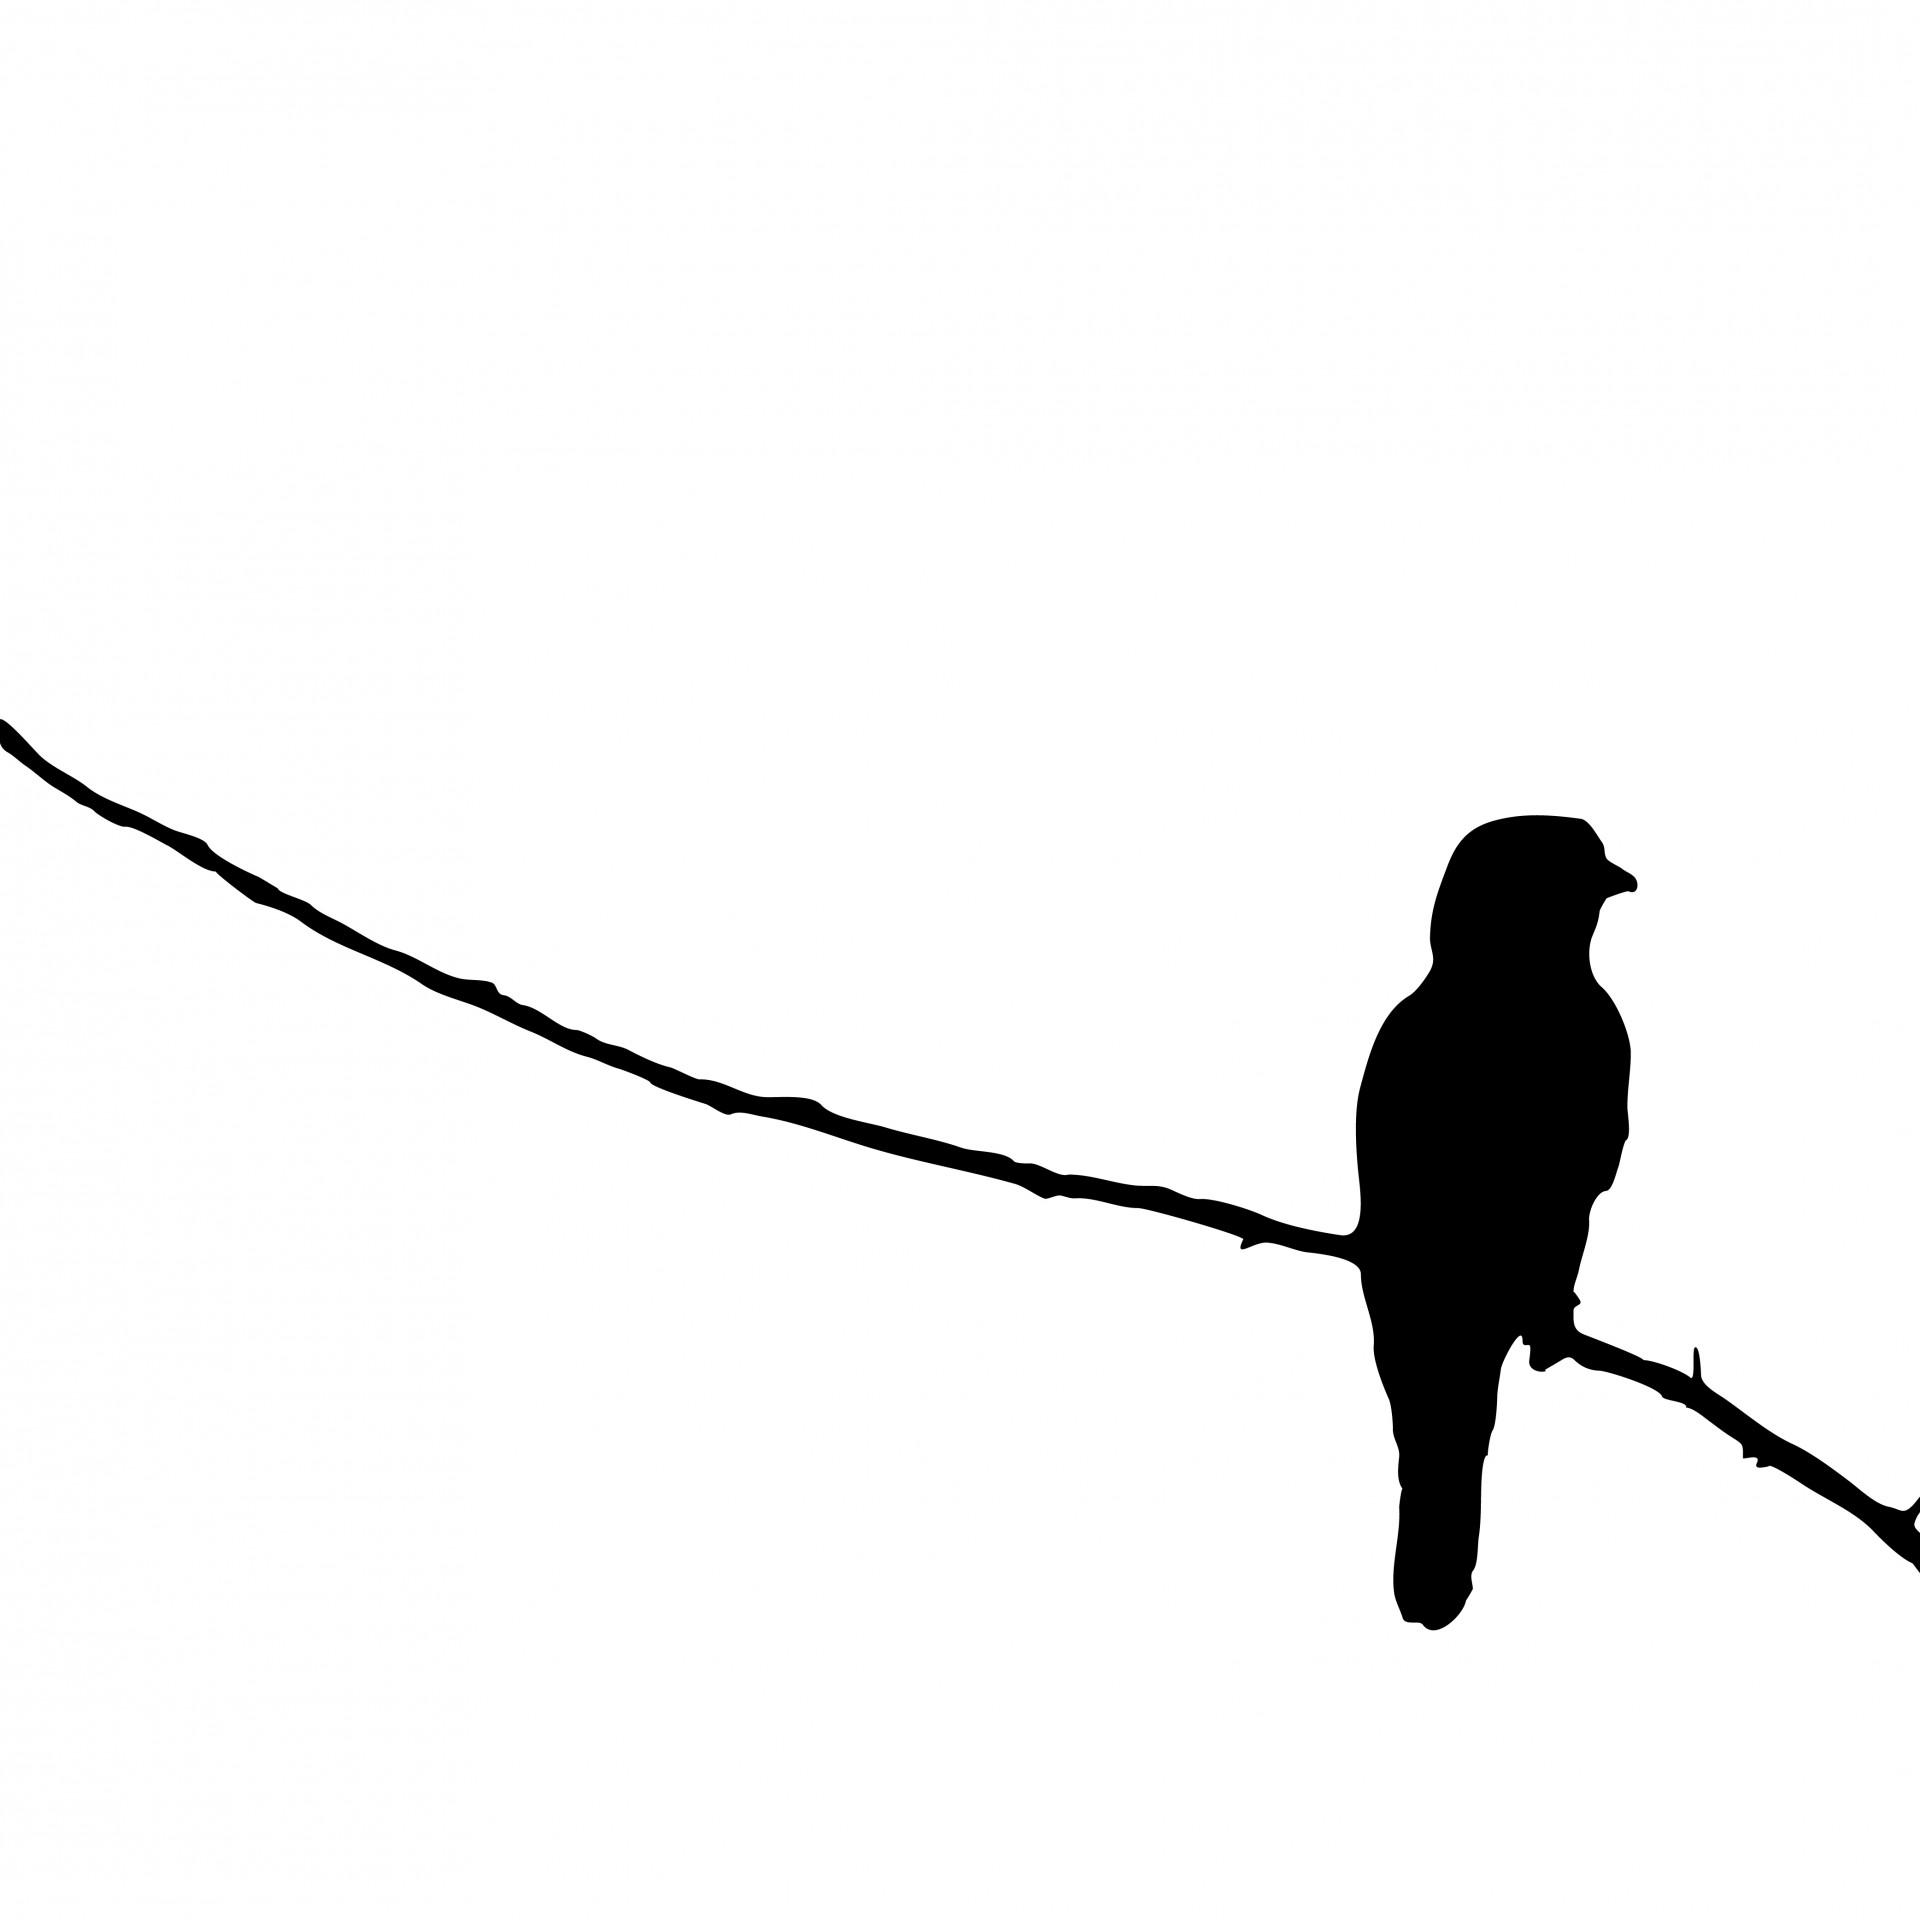 1920x1920 Bird On Branch Silhouette Free Stock Photo